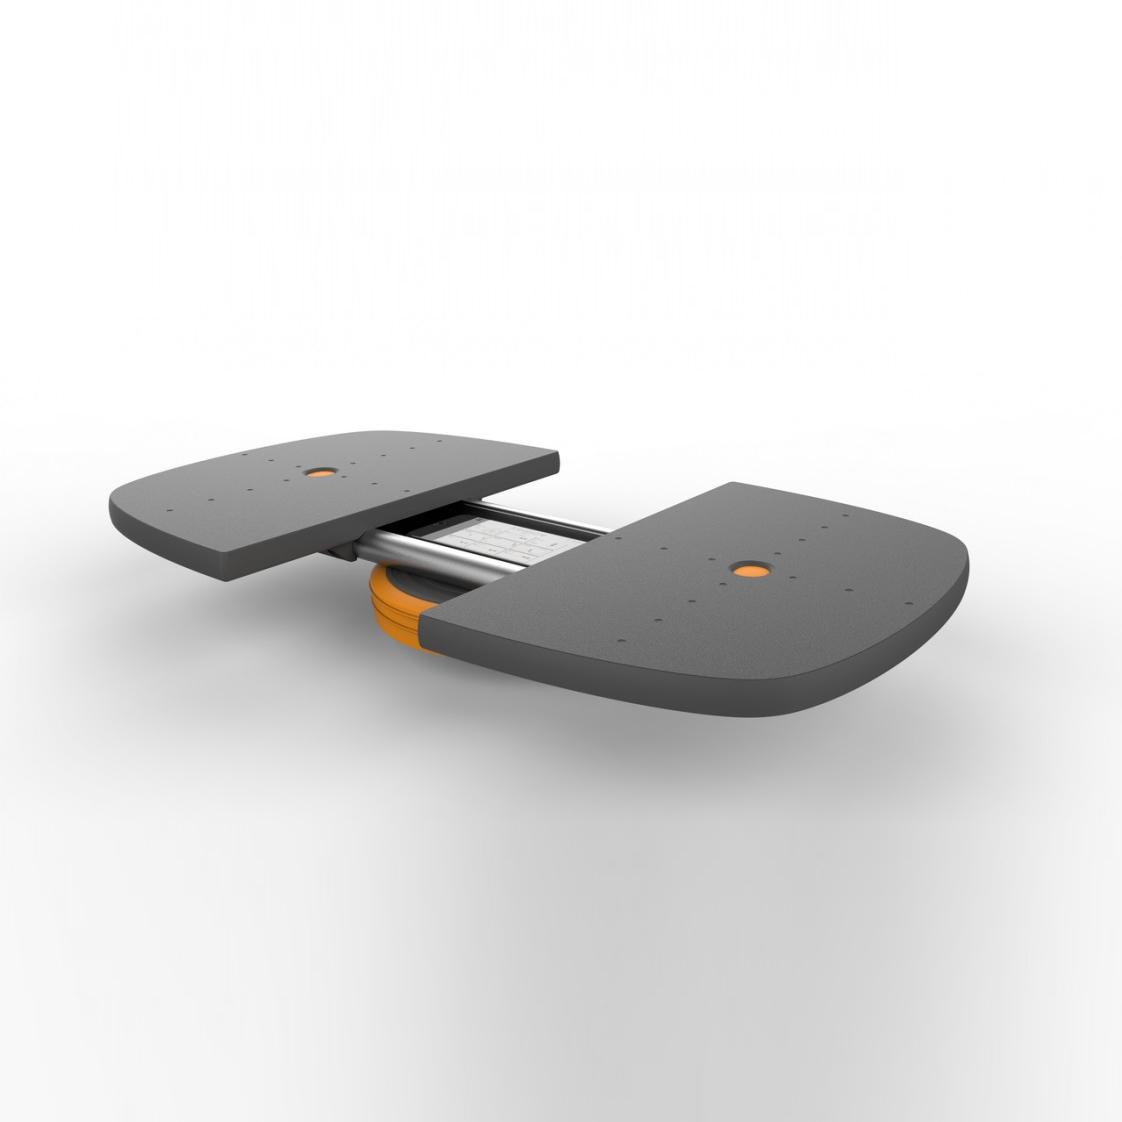 modern-movement-m-pad-balance-trainer_A11